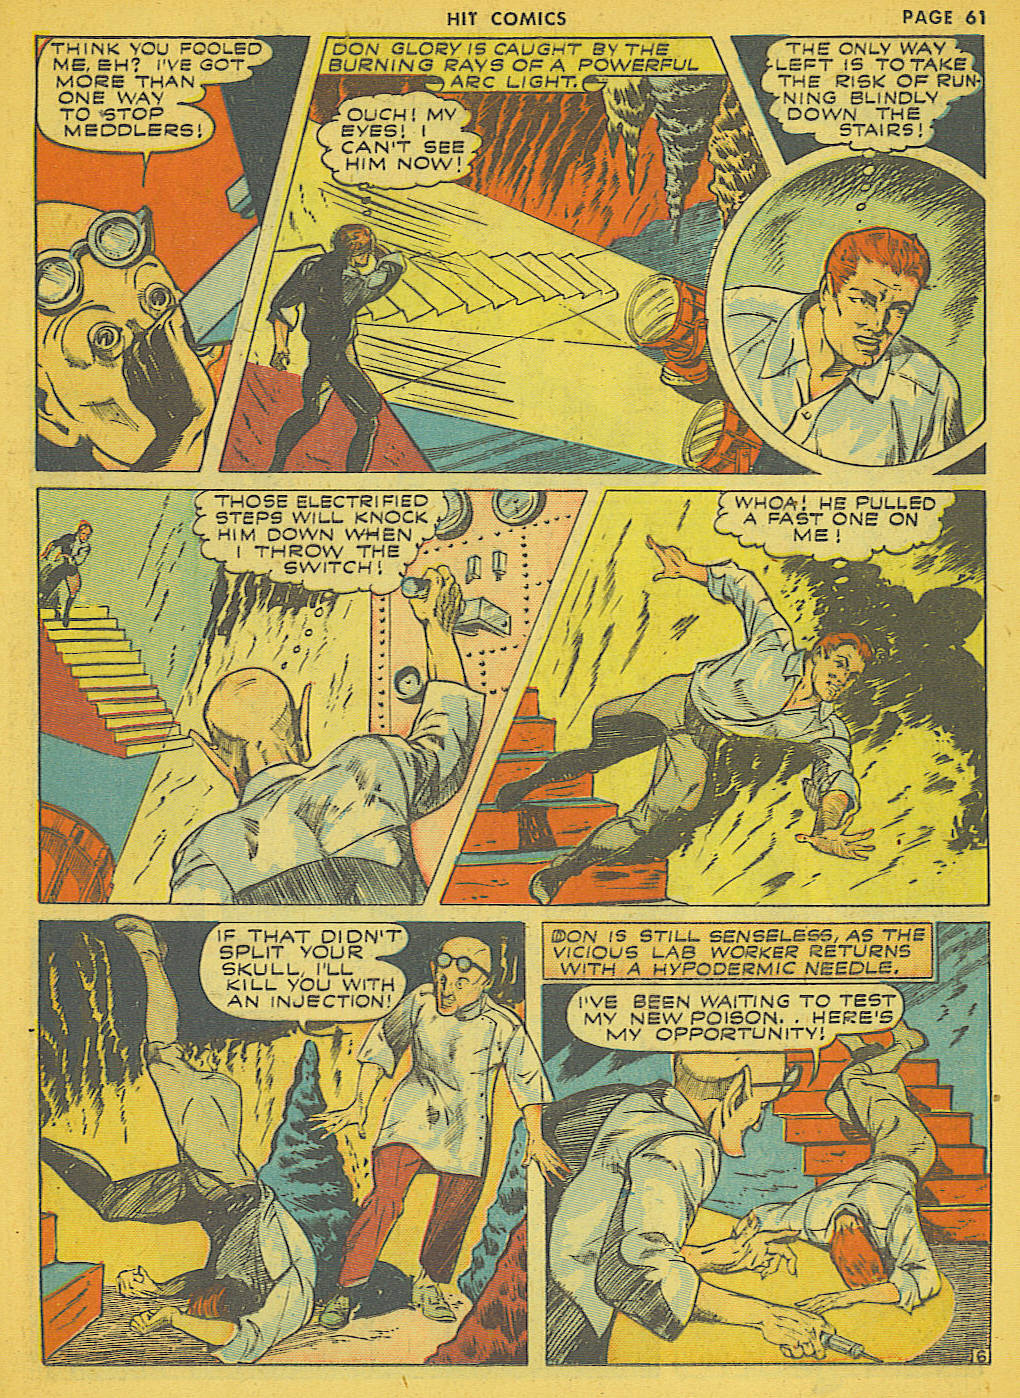 Read online Hit Comics comic -  Issue #21 - 63